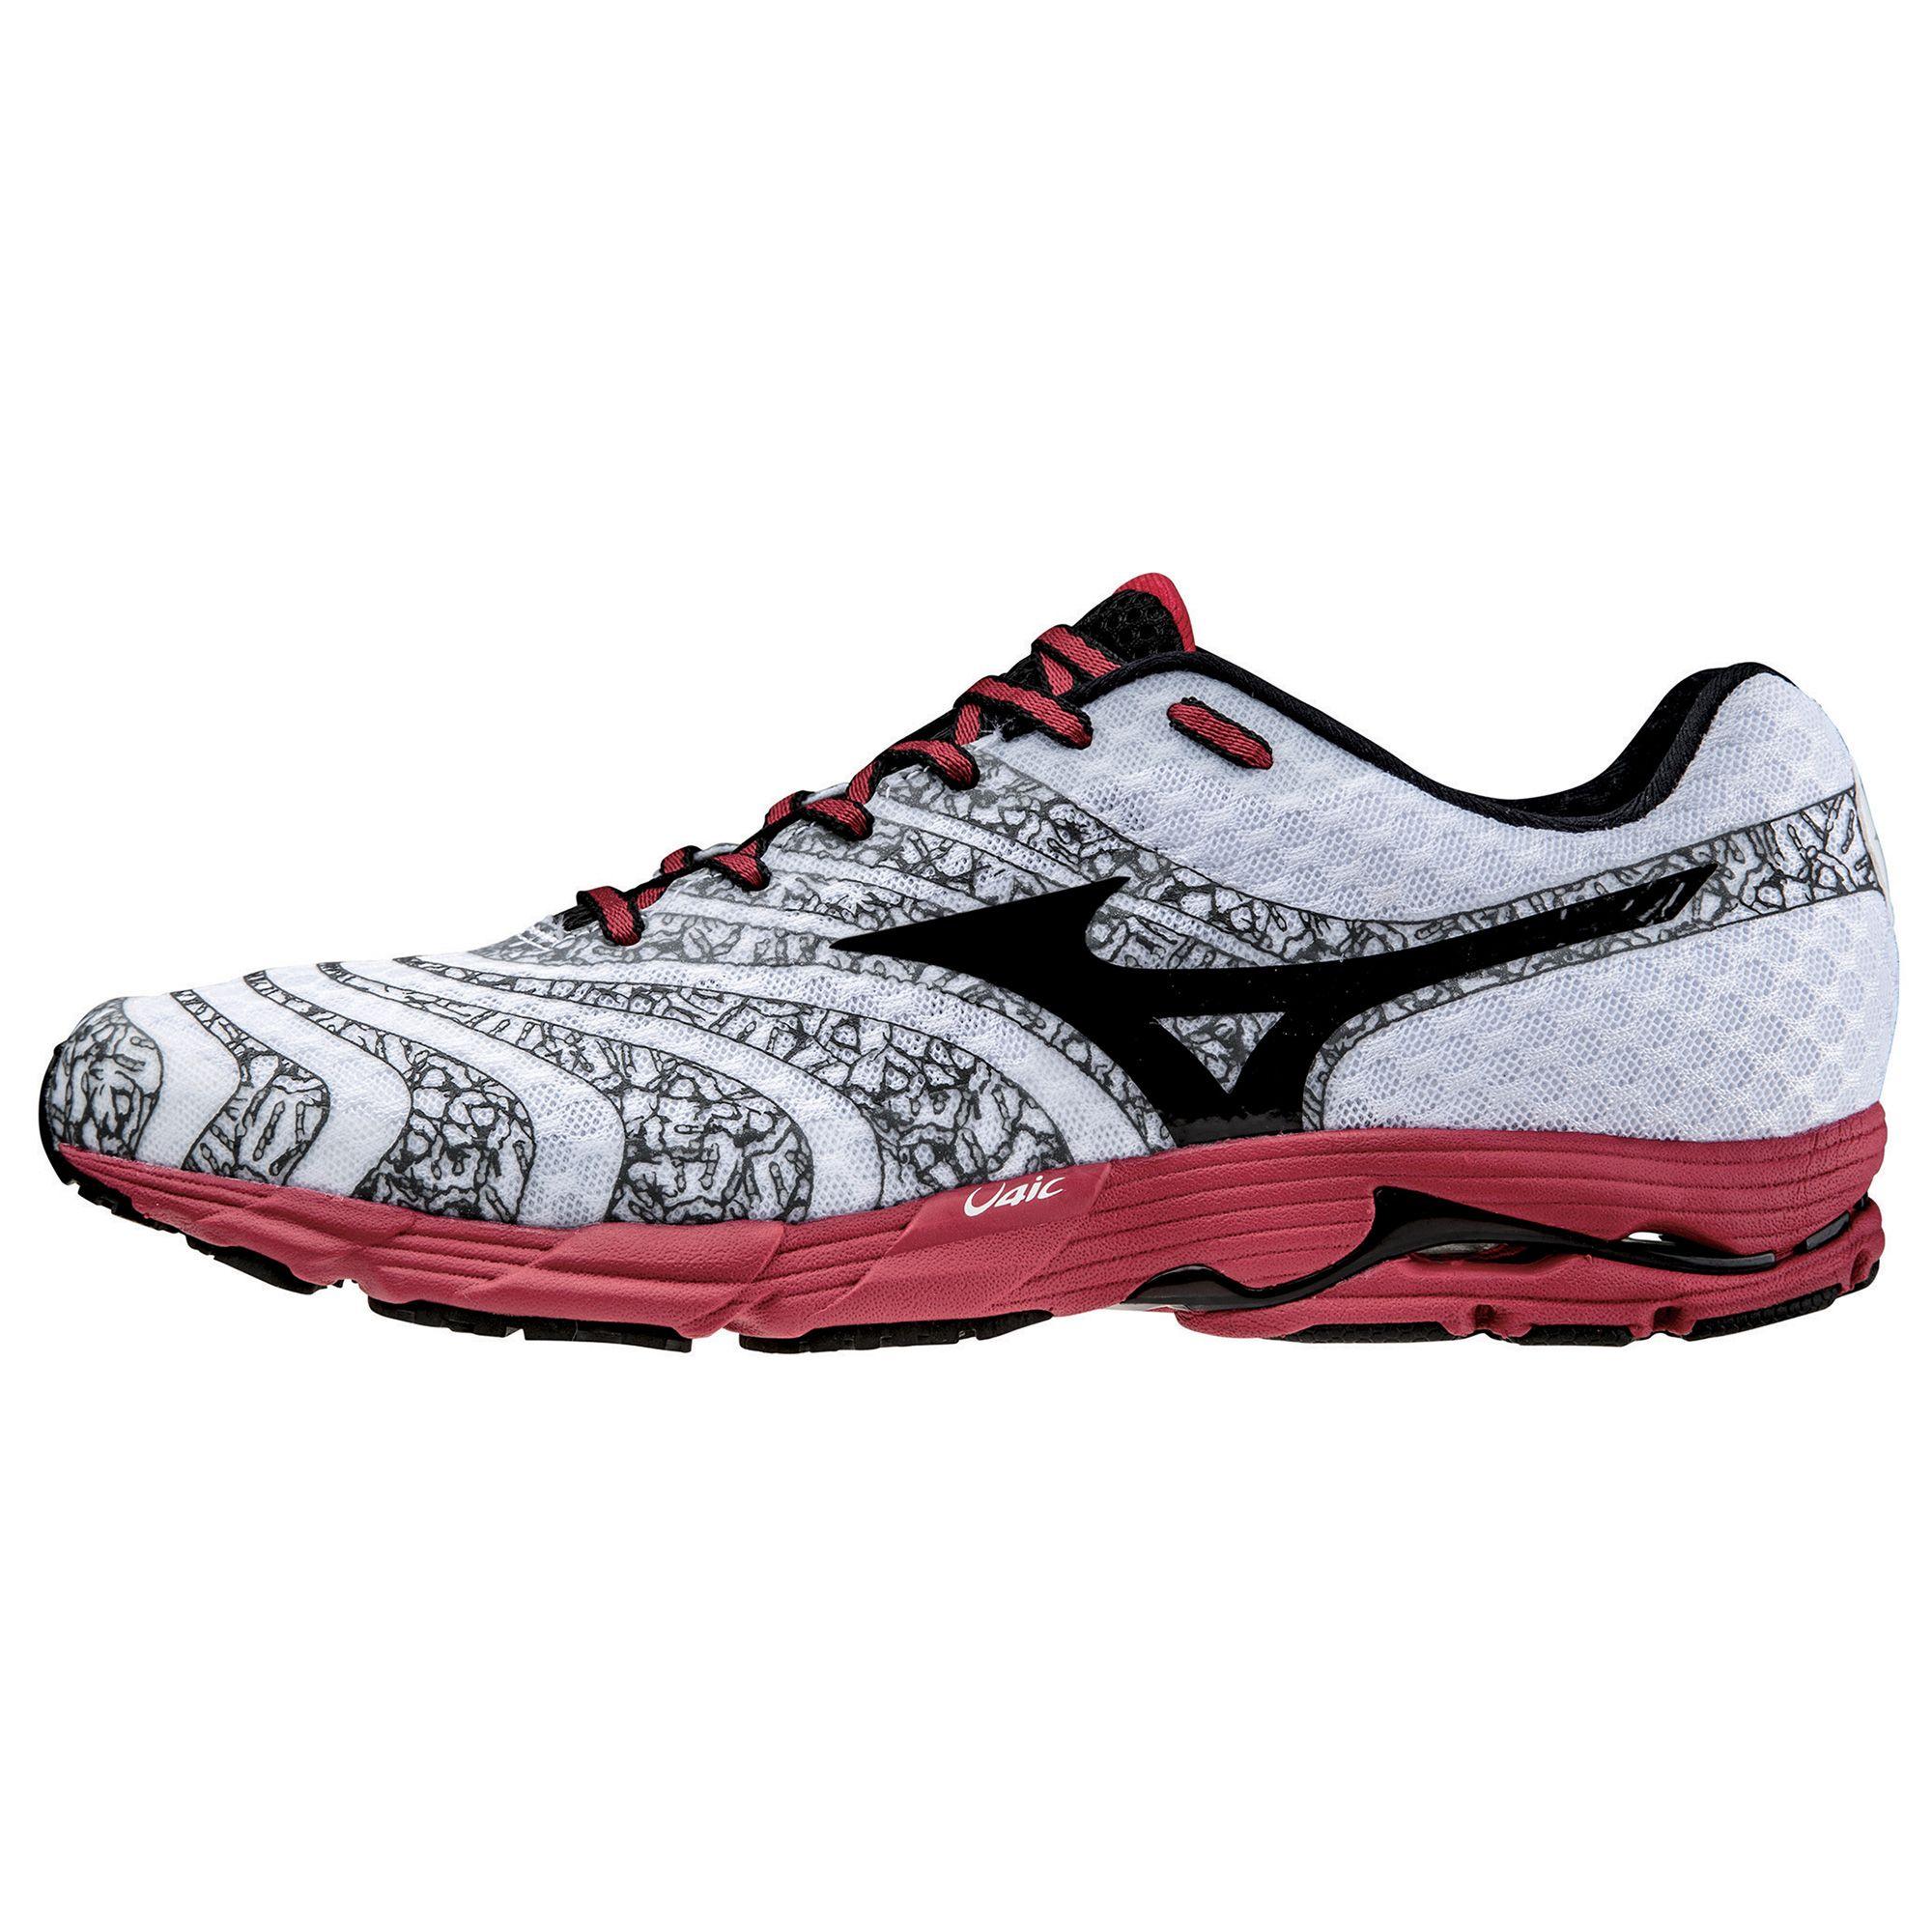 Mizuno Wave Sayonara 2 Mens Running Shoes Sweatband Com